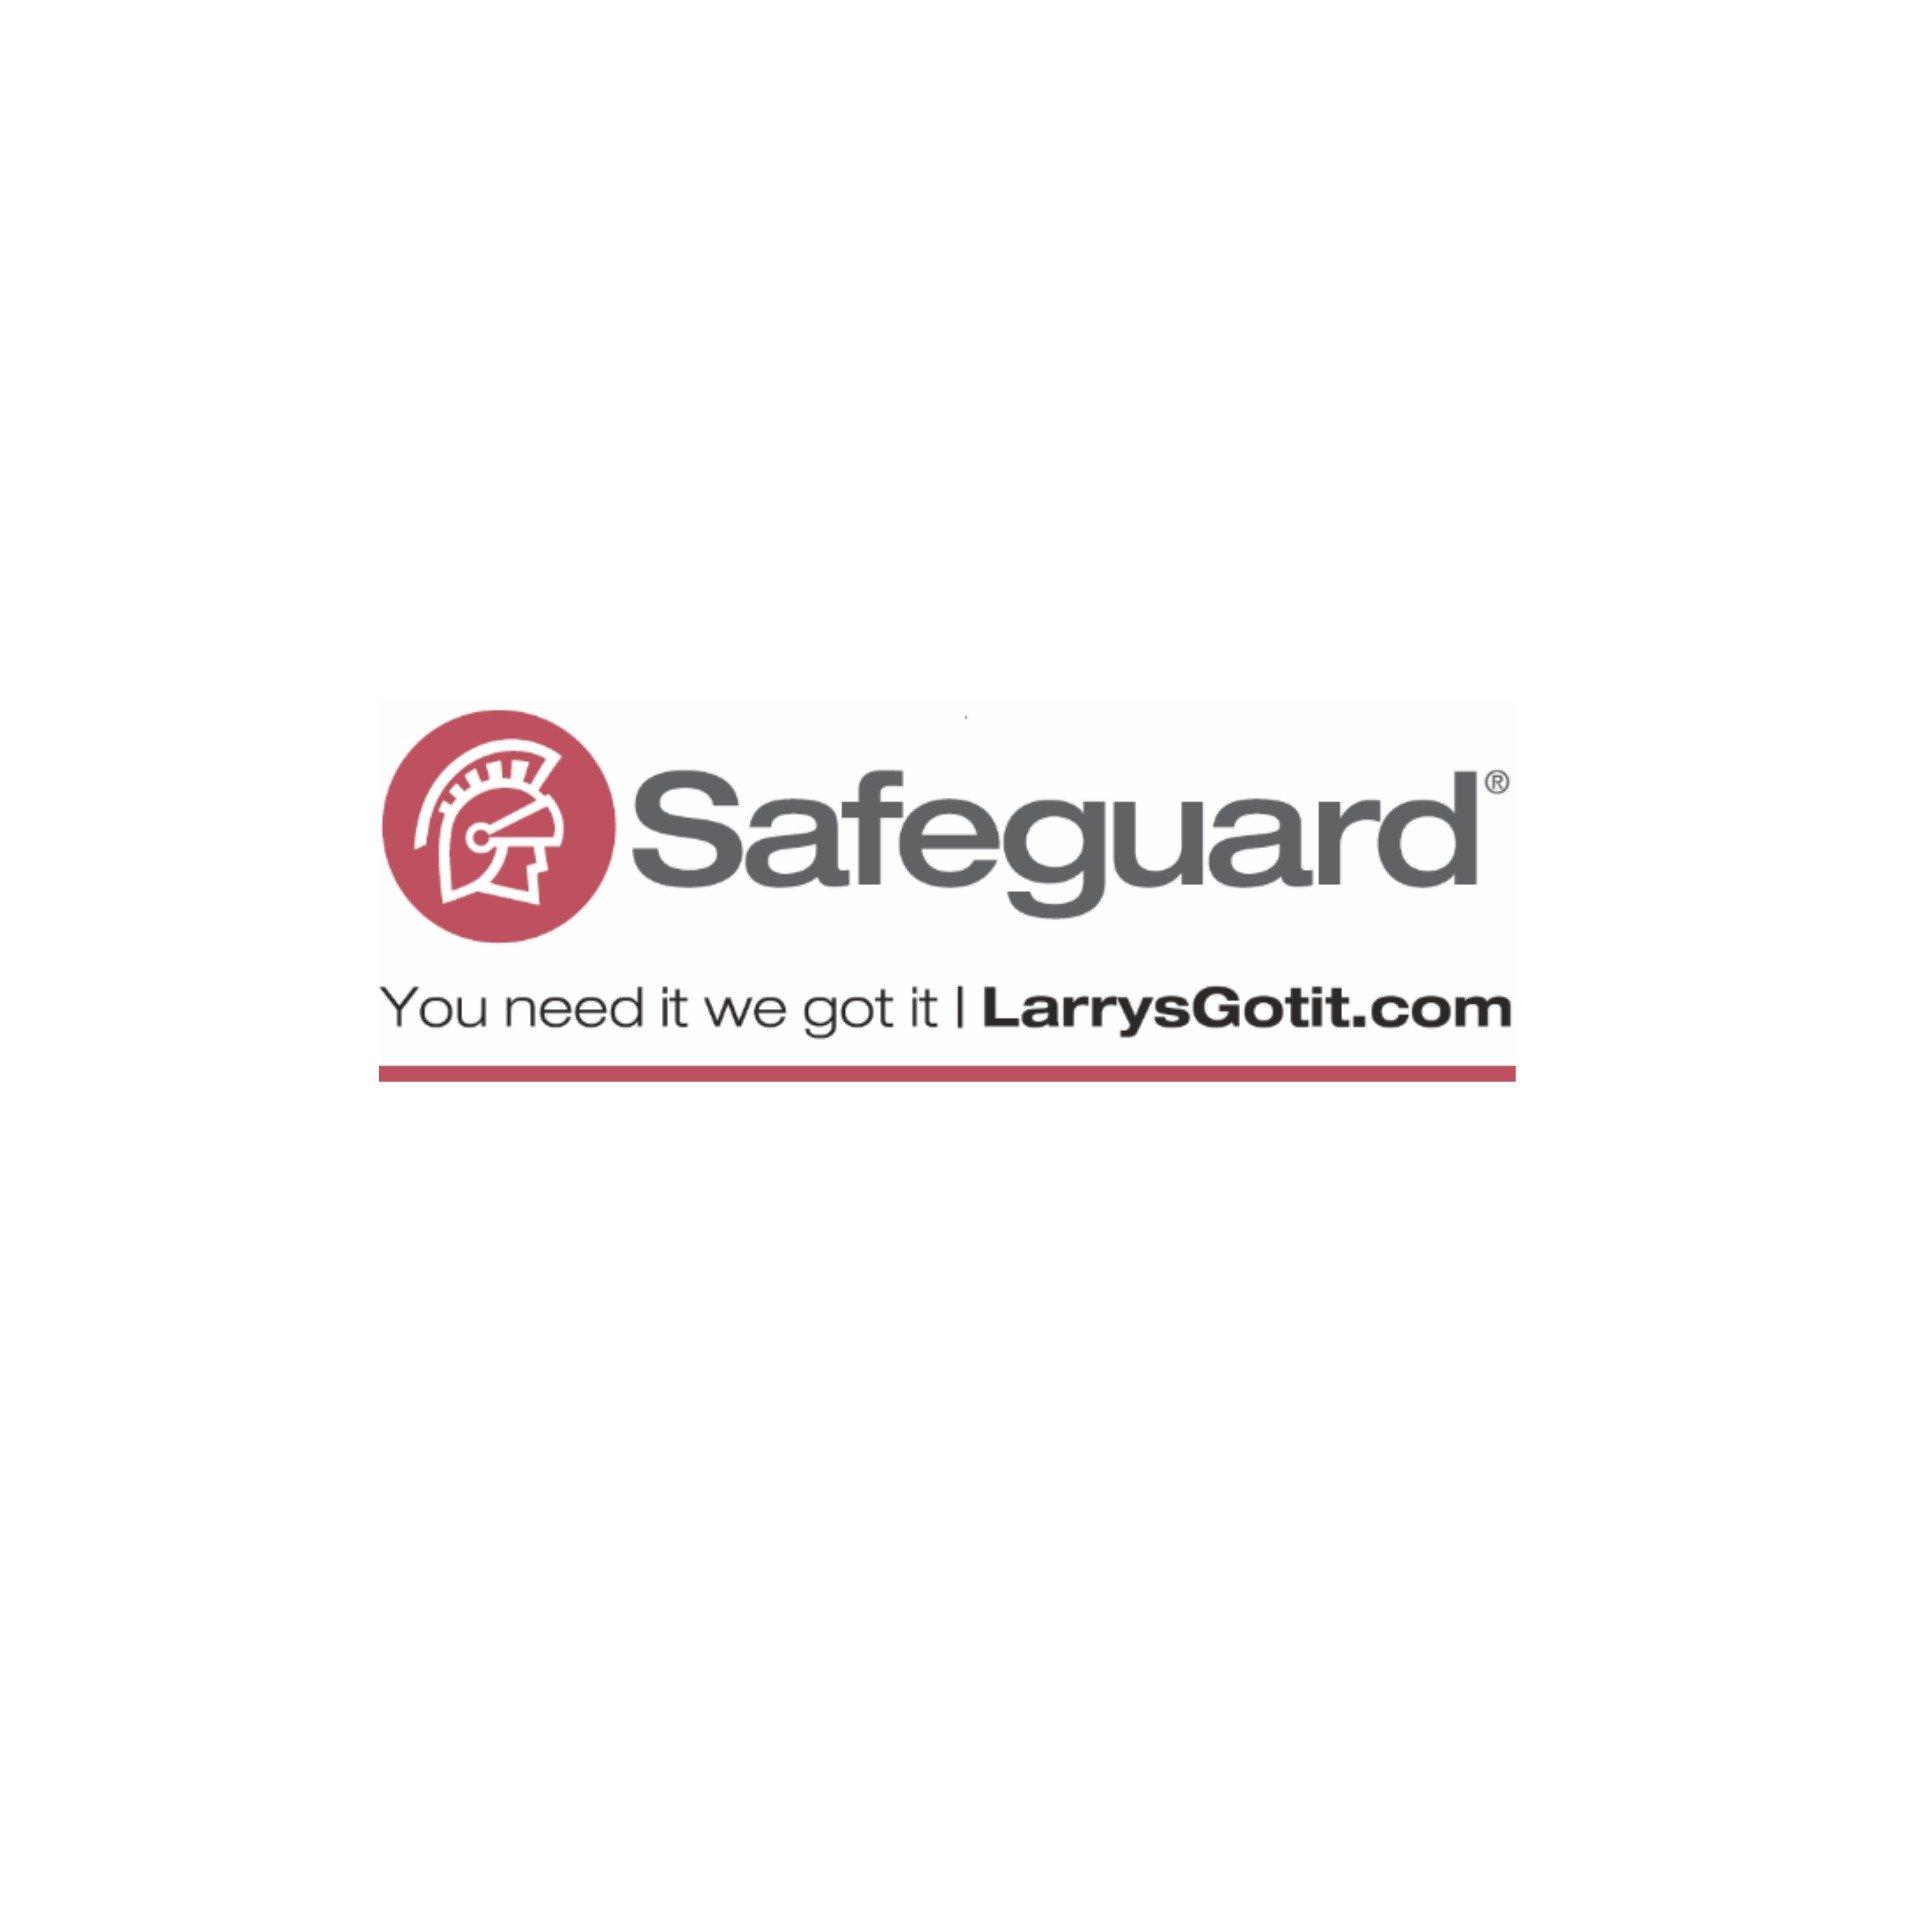 Safeguard Marketing